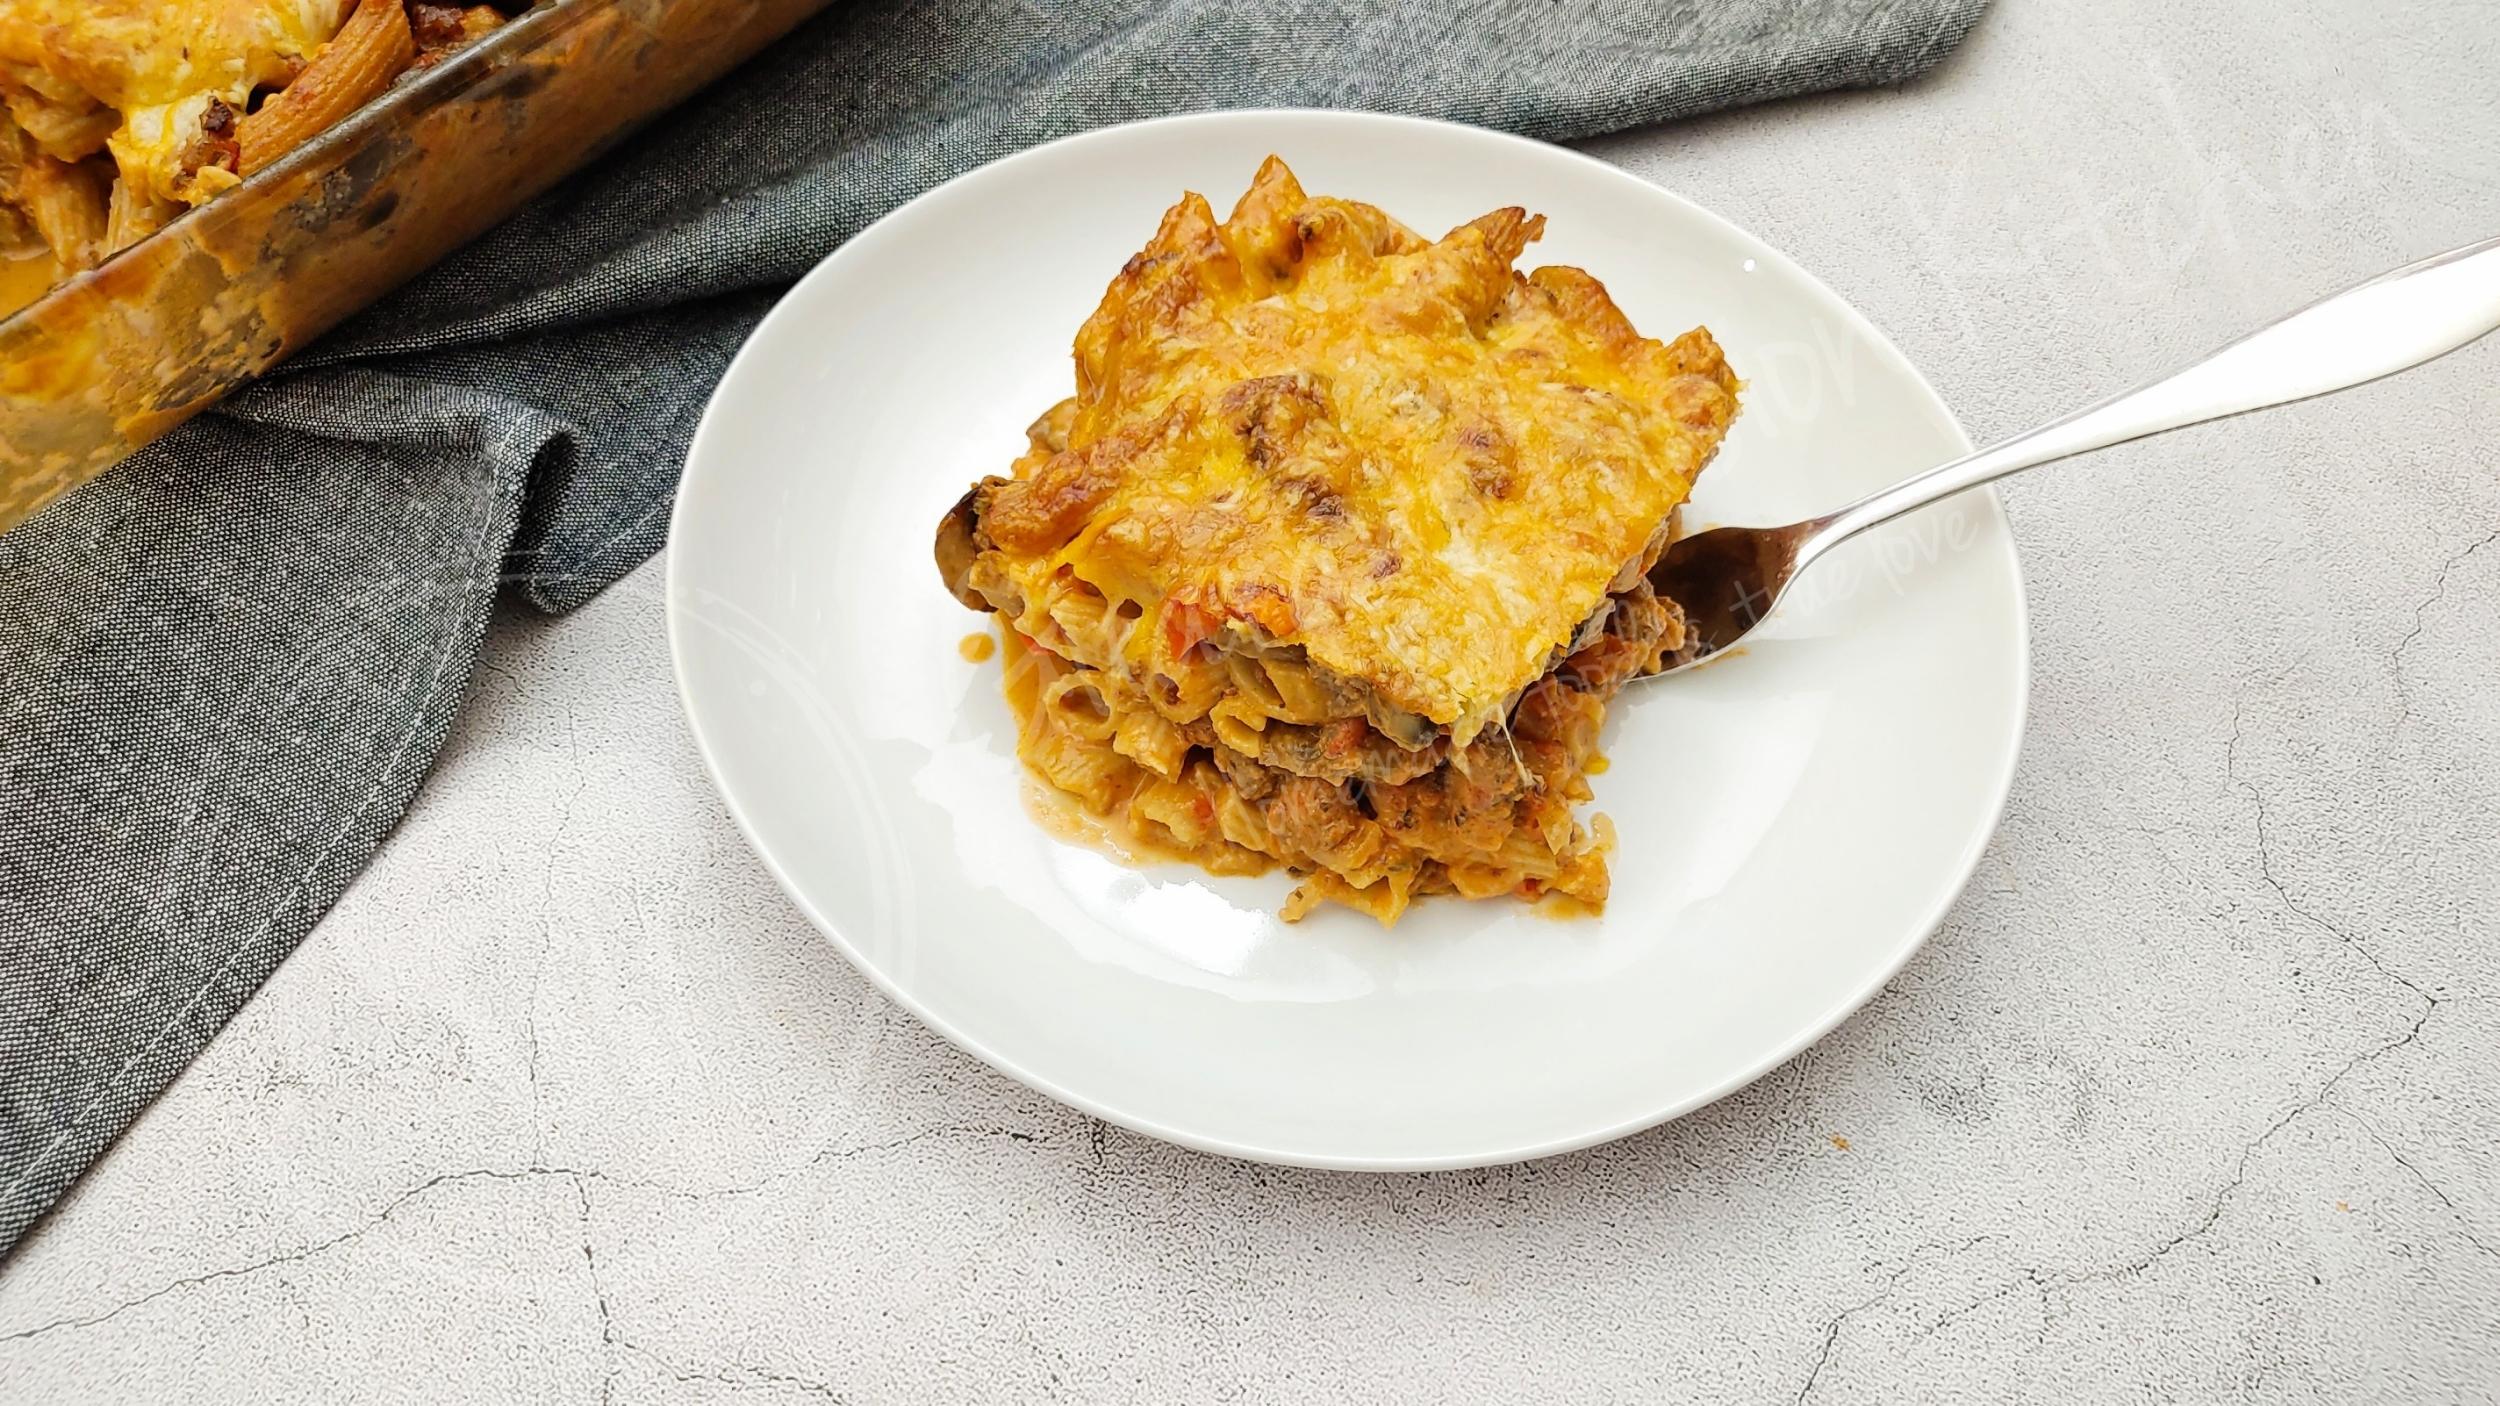 Baked Ziti with Italian Sausage and Mushrooms